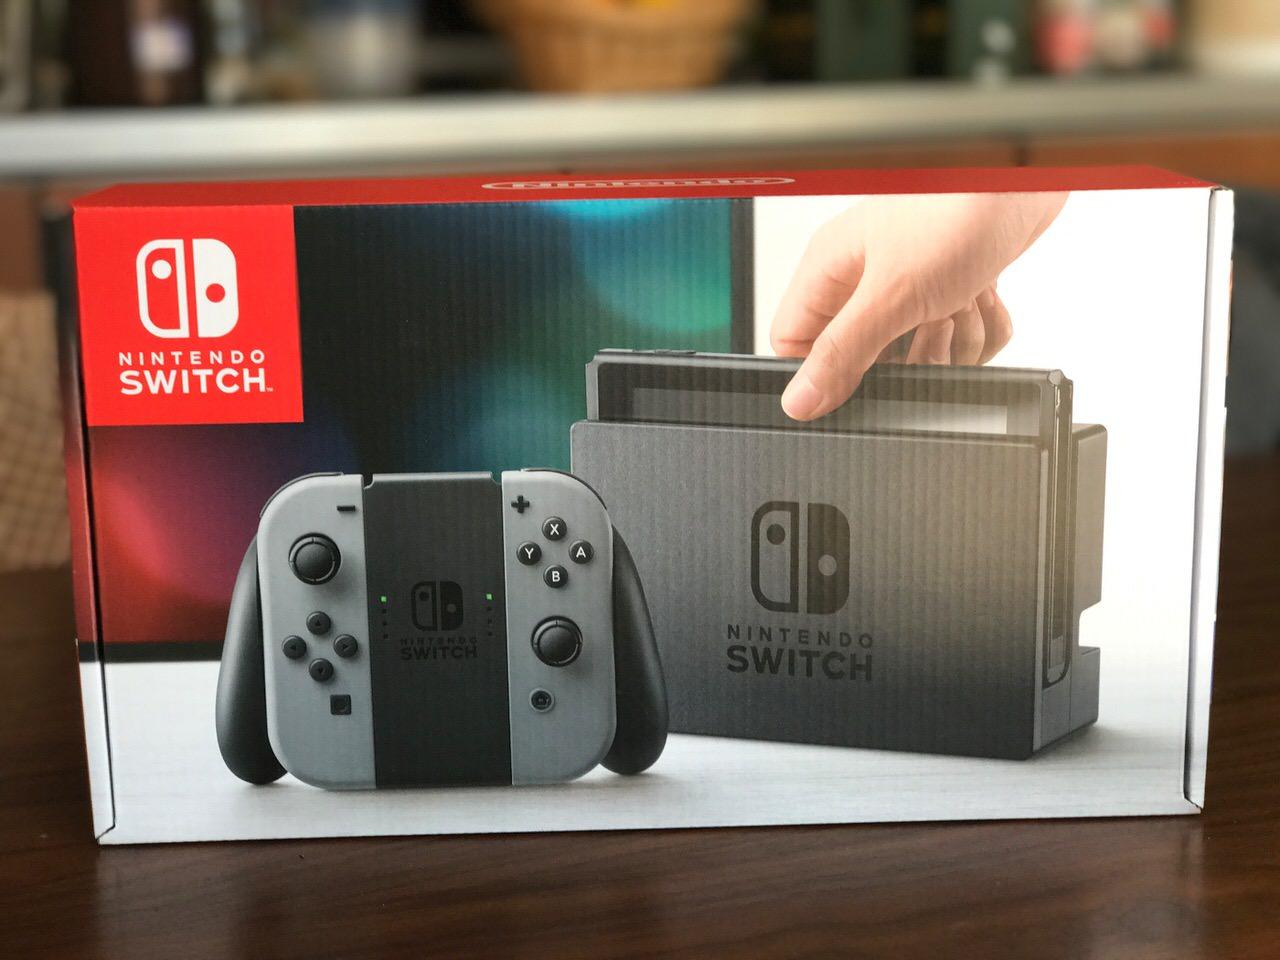 Nintendo switch setup 6748